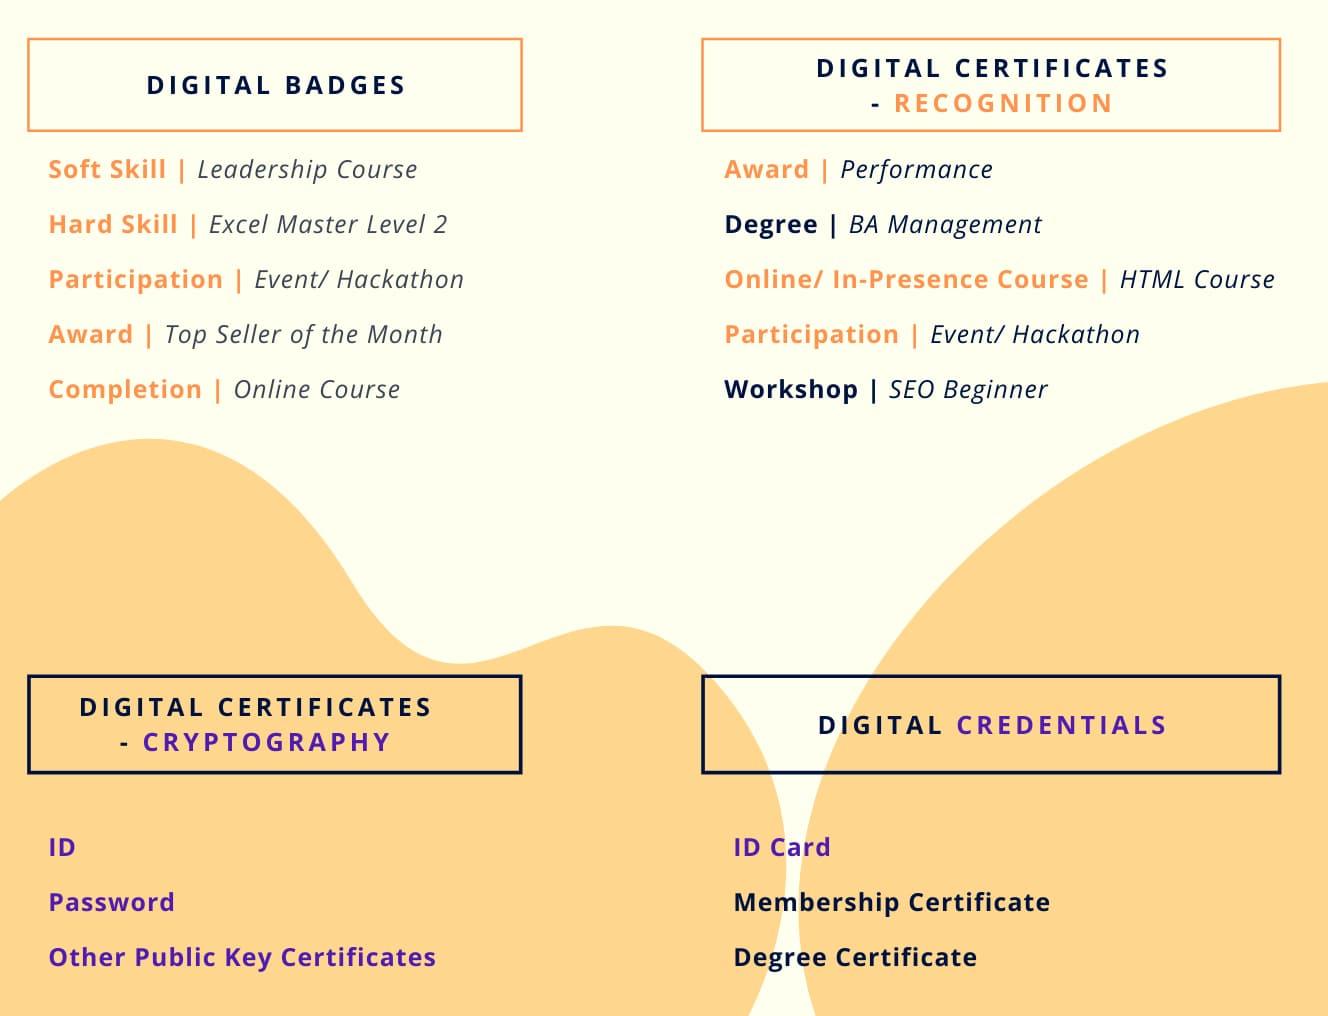 differences between digital badges, digital certificates and digital credentials